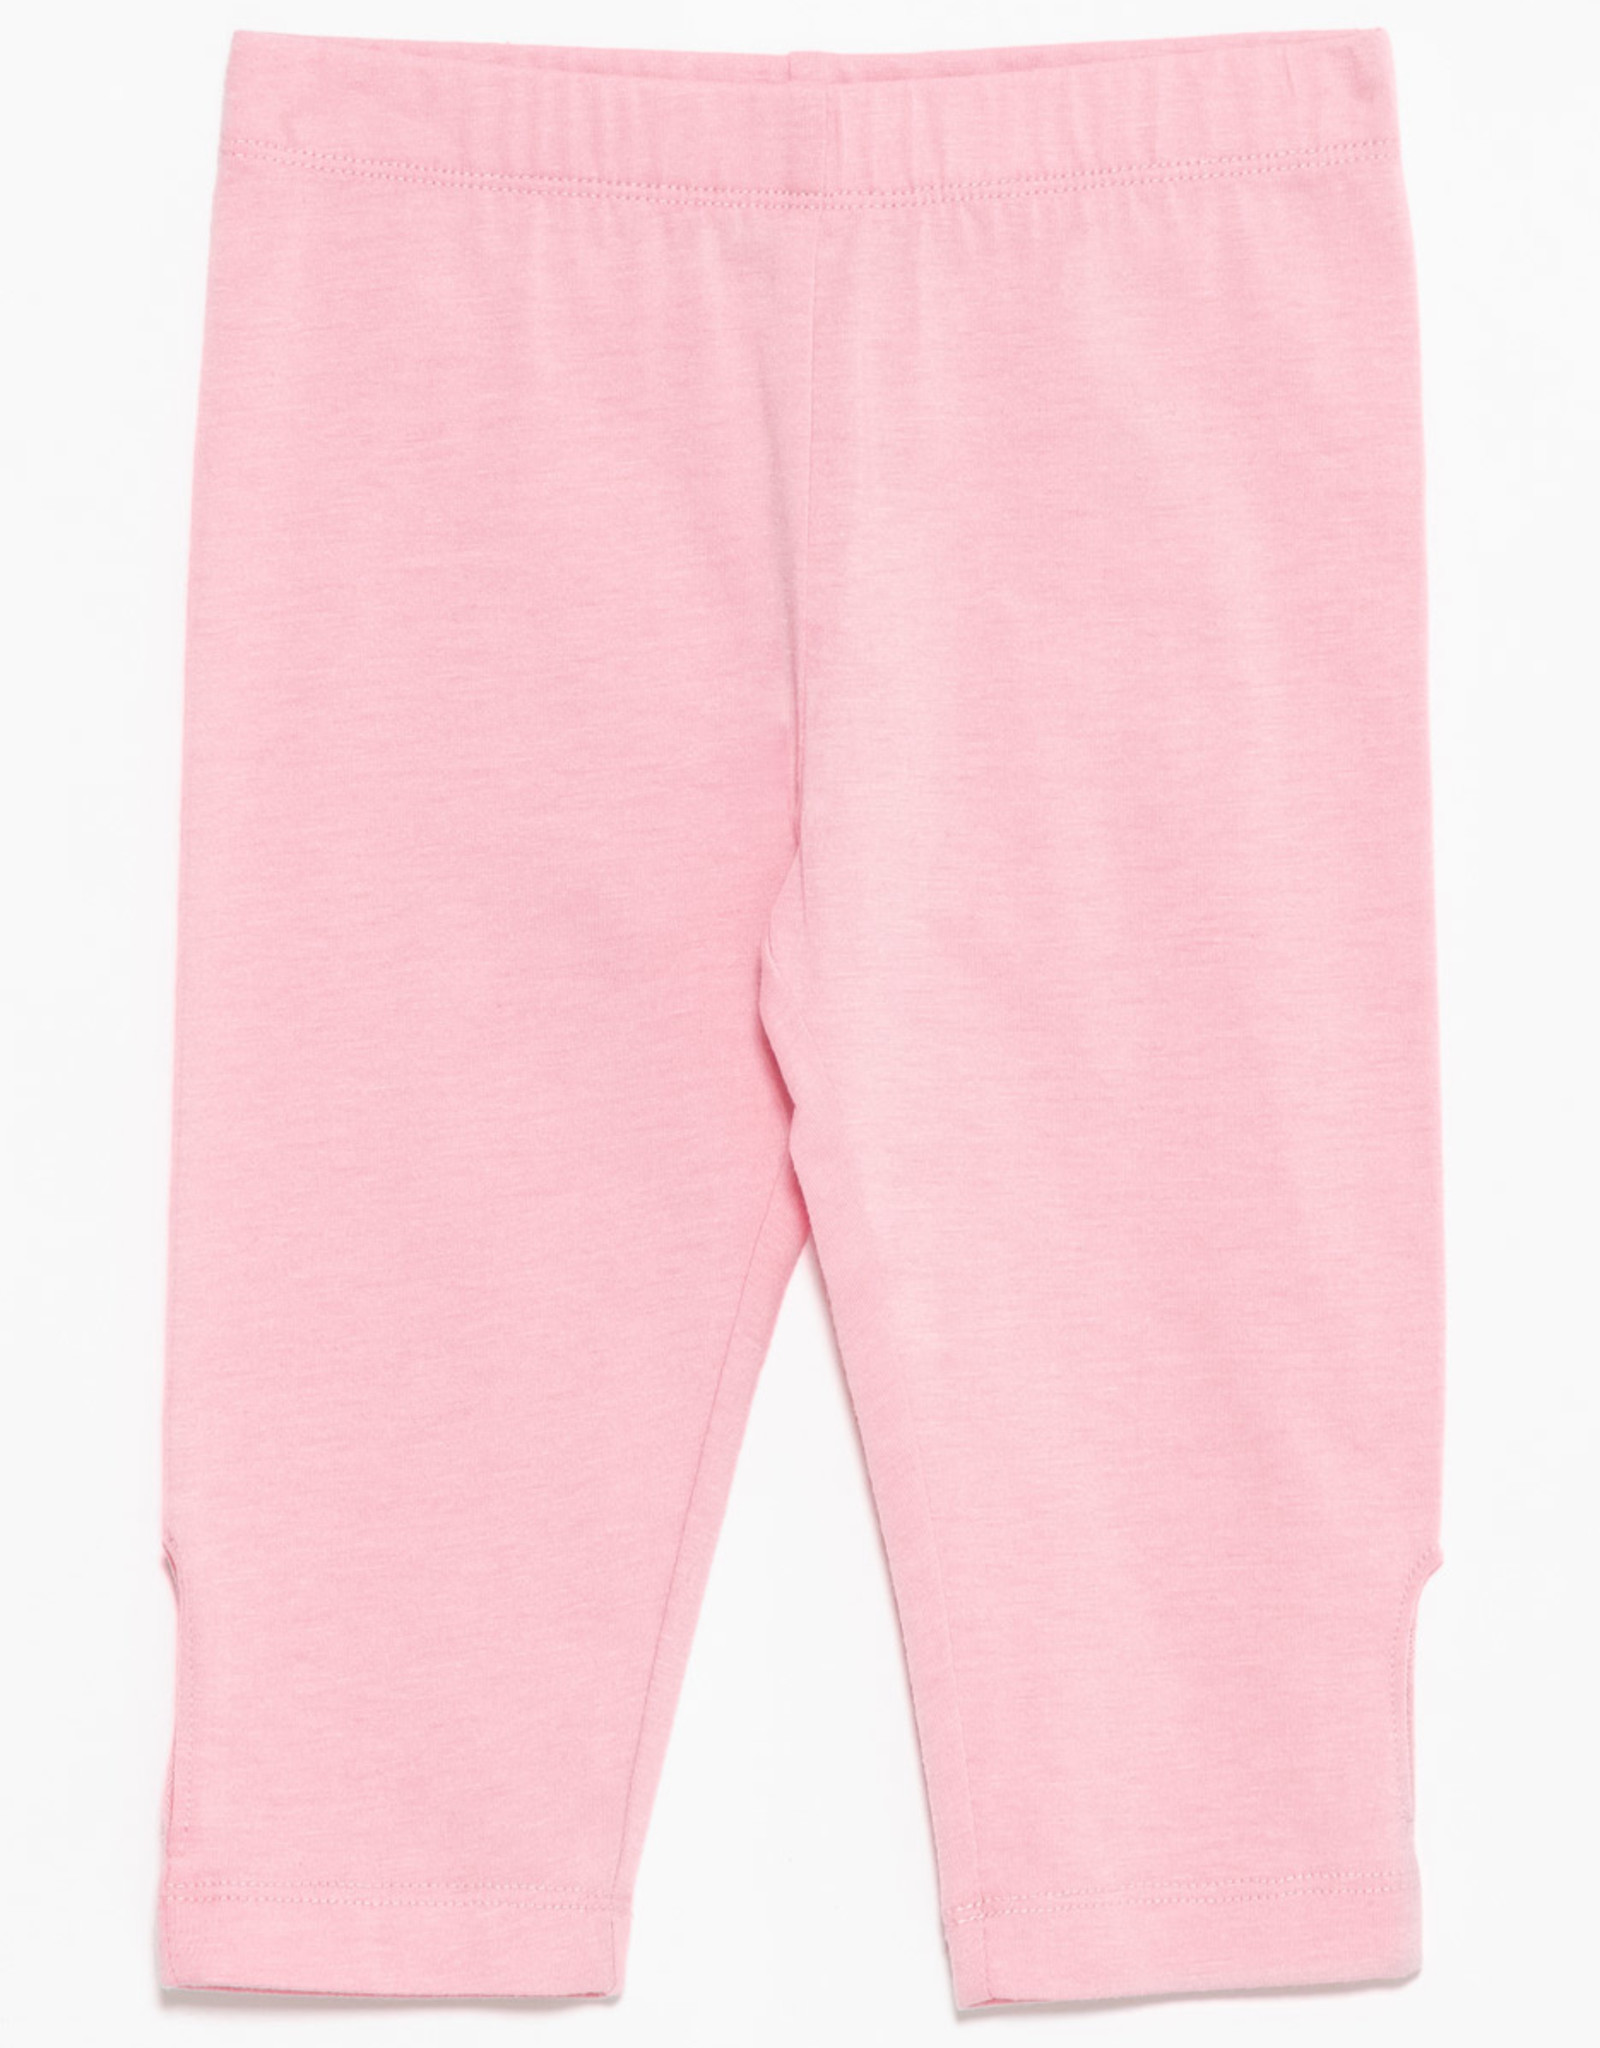 SP21 G Yth Pink Capri Legging